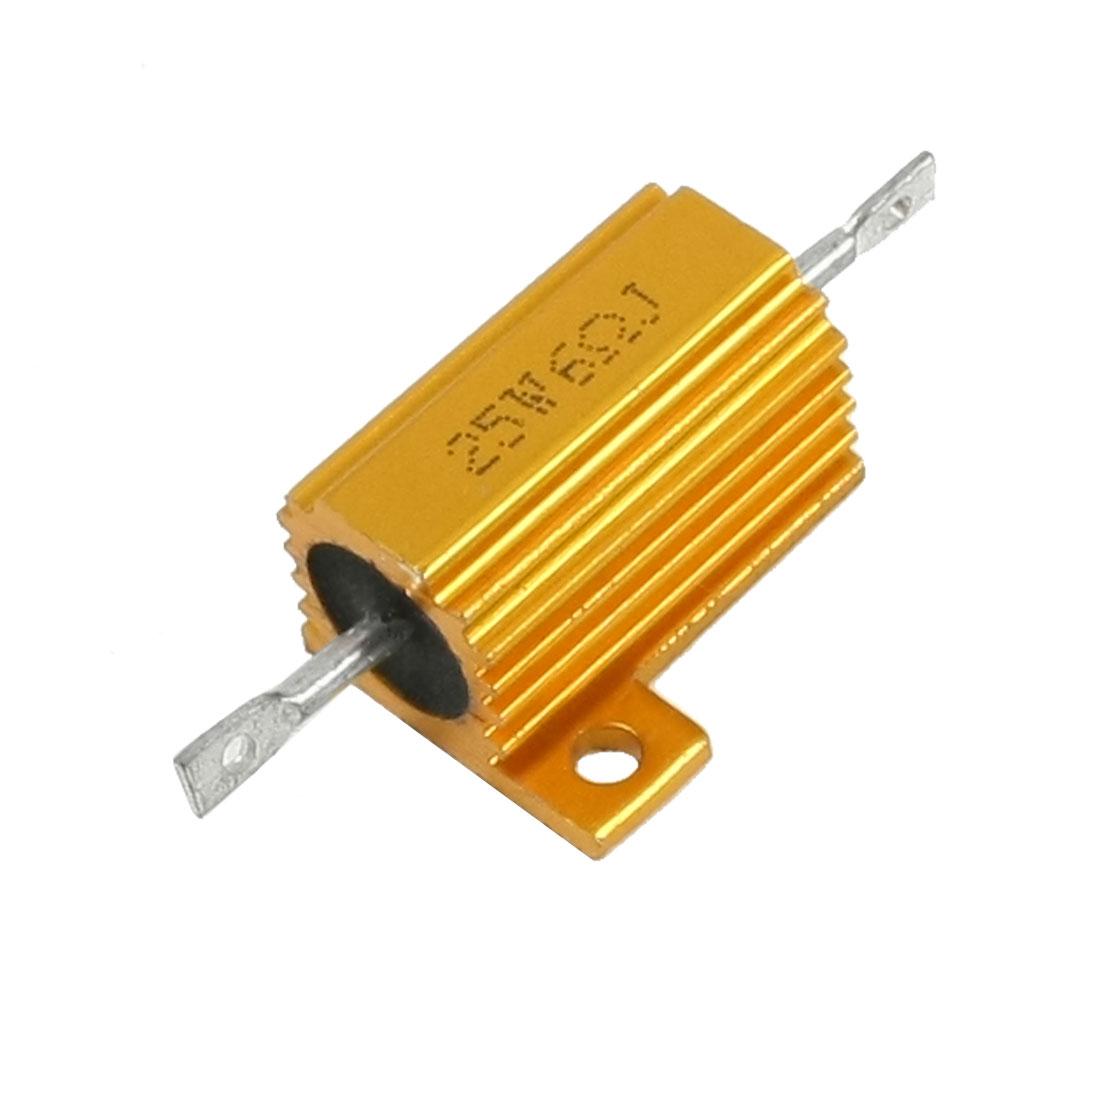 25W % 6 Ohm Gold Tone Resistance Aluminum Shell Resistors